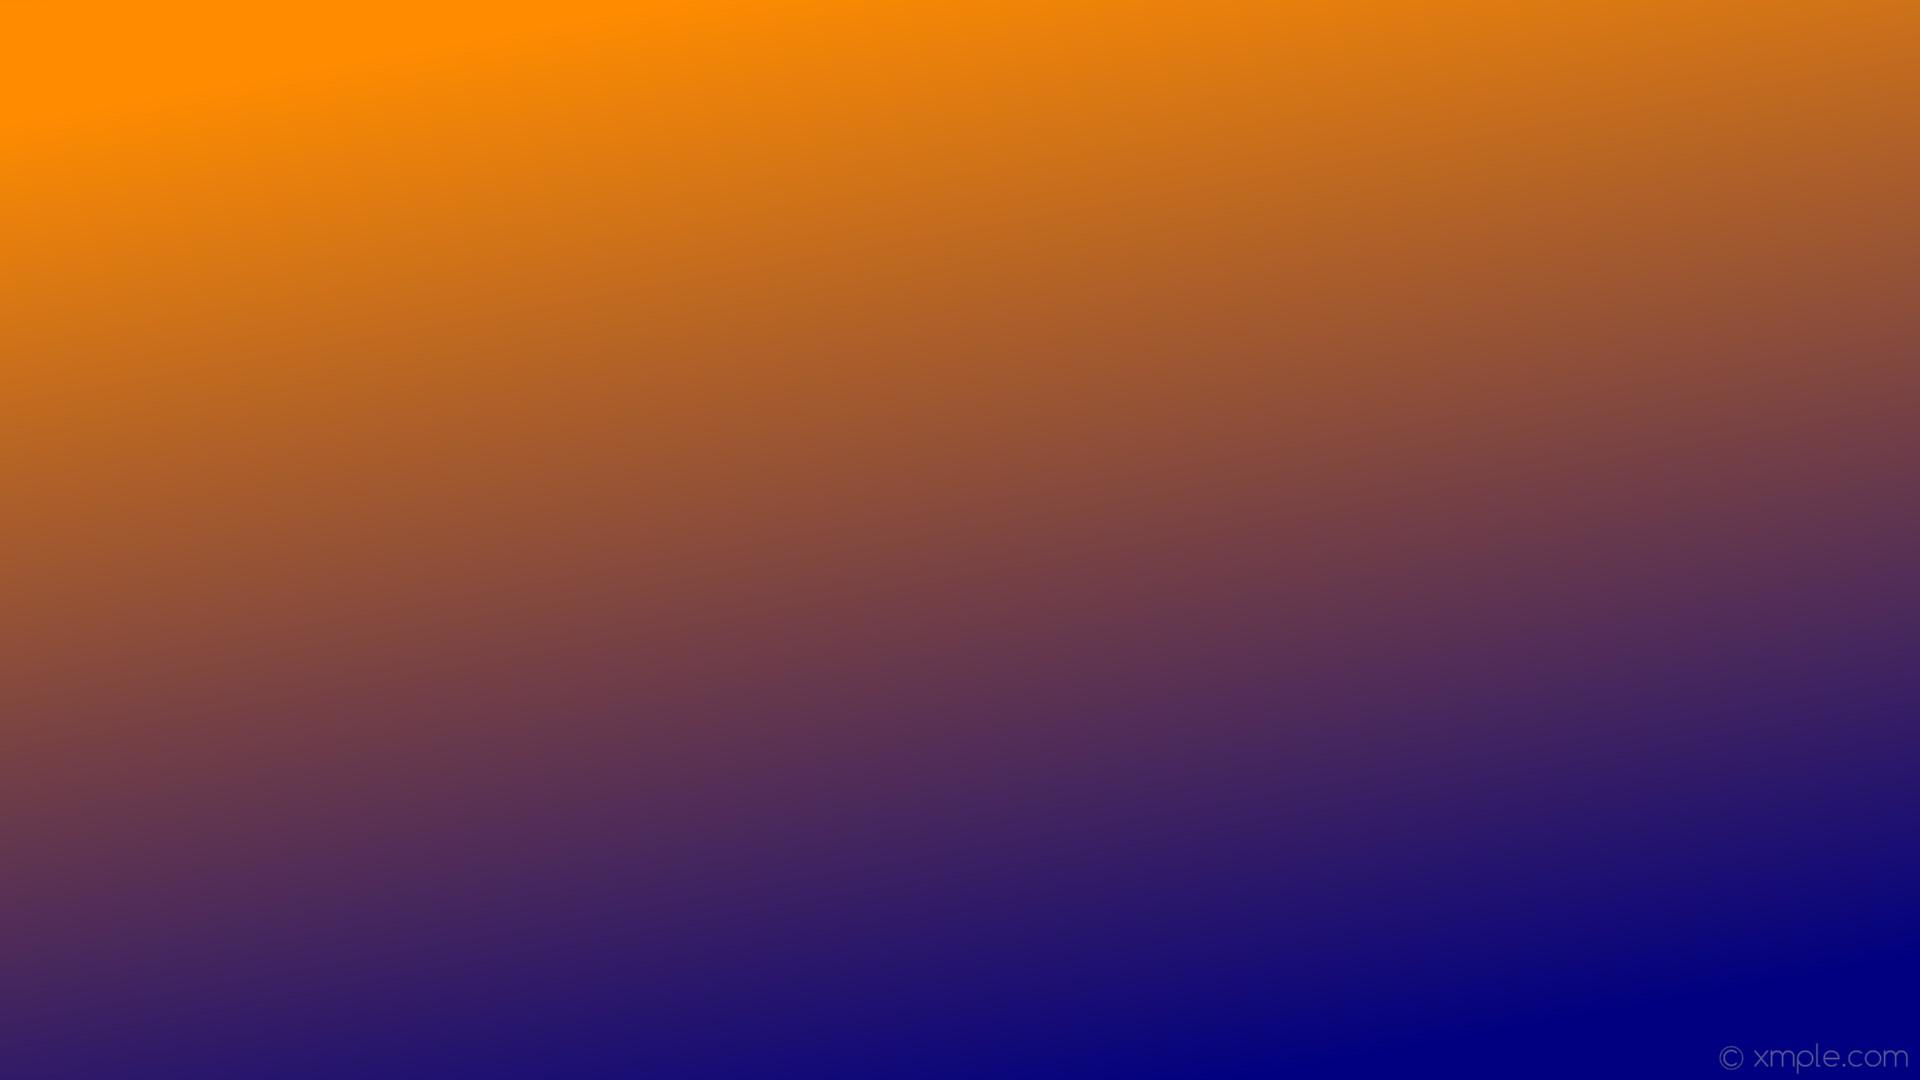 Blue And Orange Background: Orange And Blue Wallpaper (71+ Images